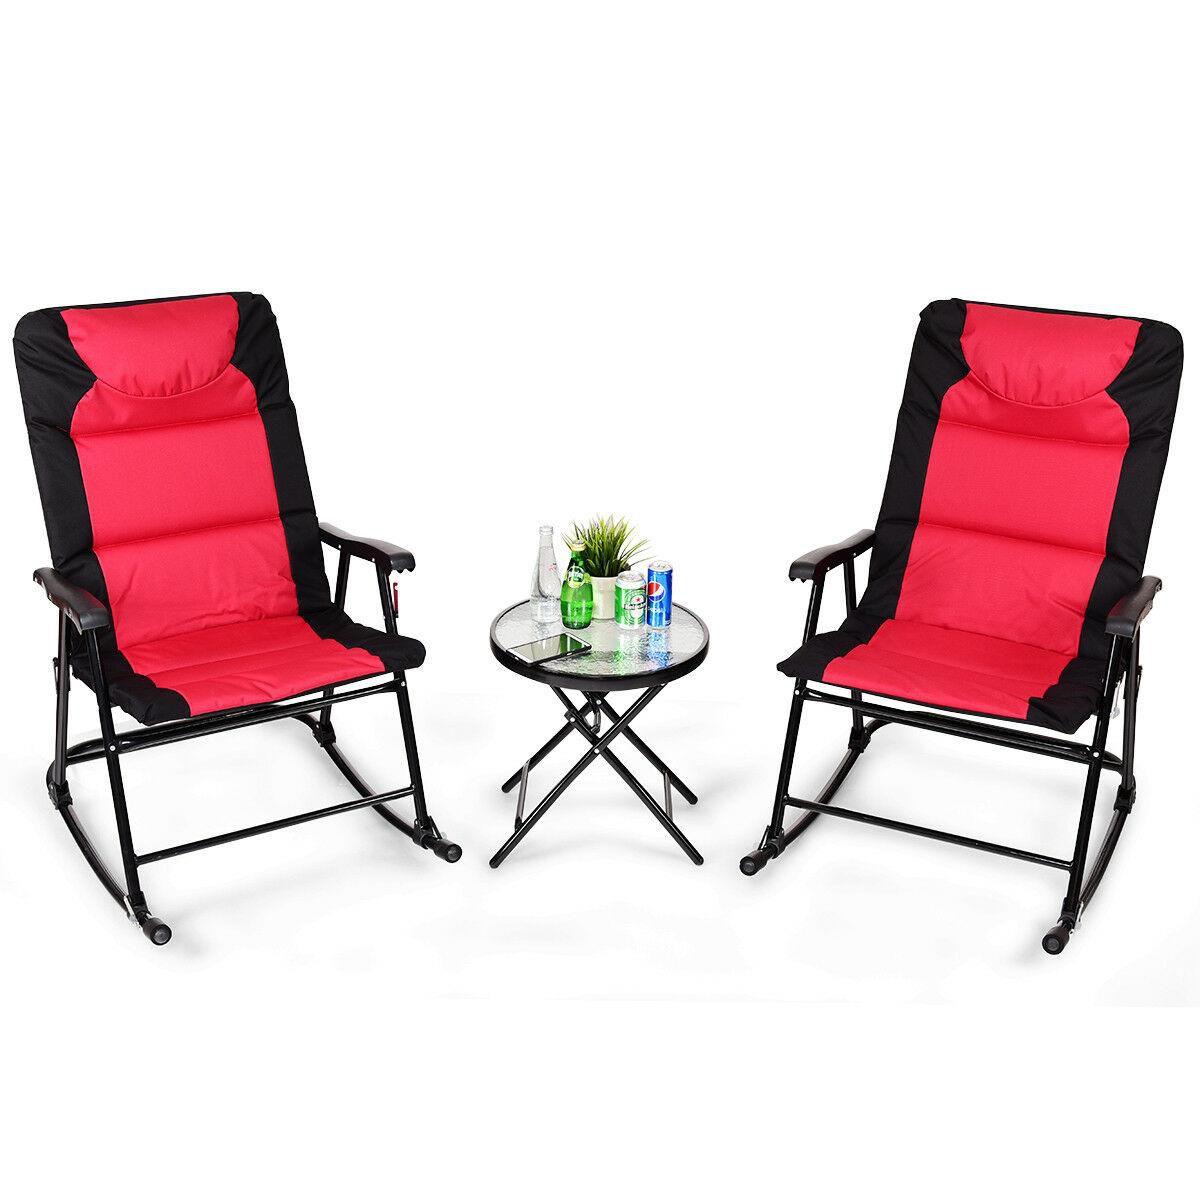 3PCS Folding Bistro Set Rocking Chair Cushioned Table Garden Furniture